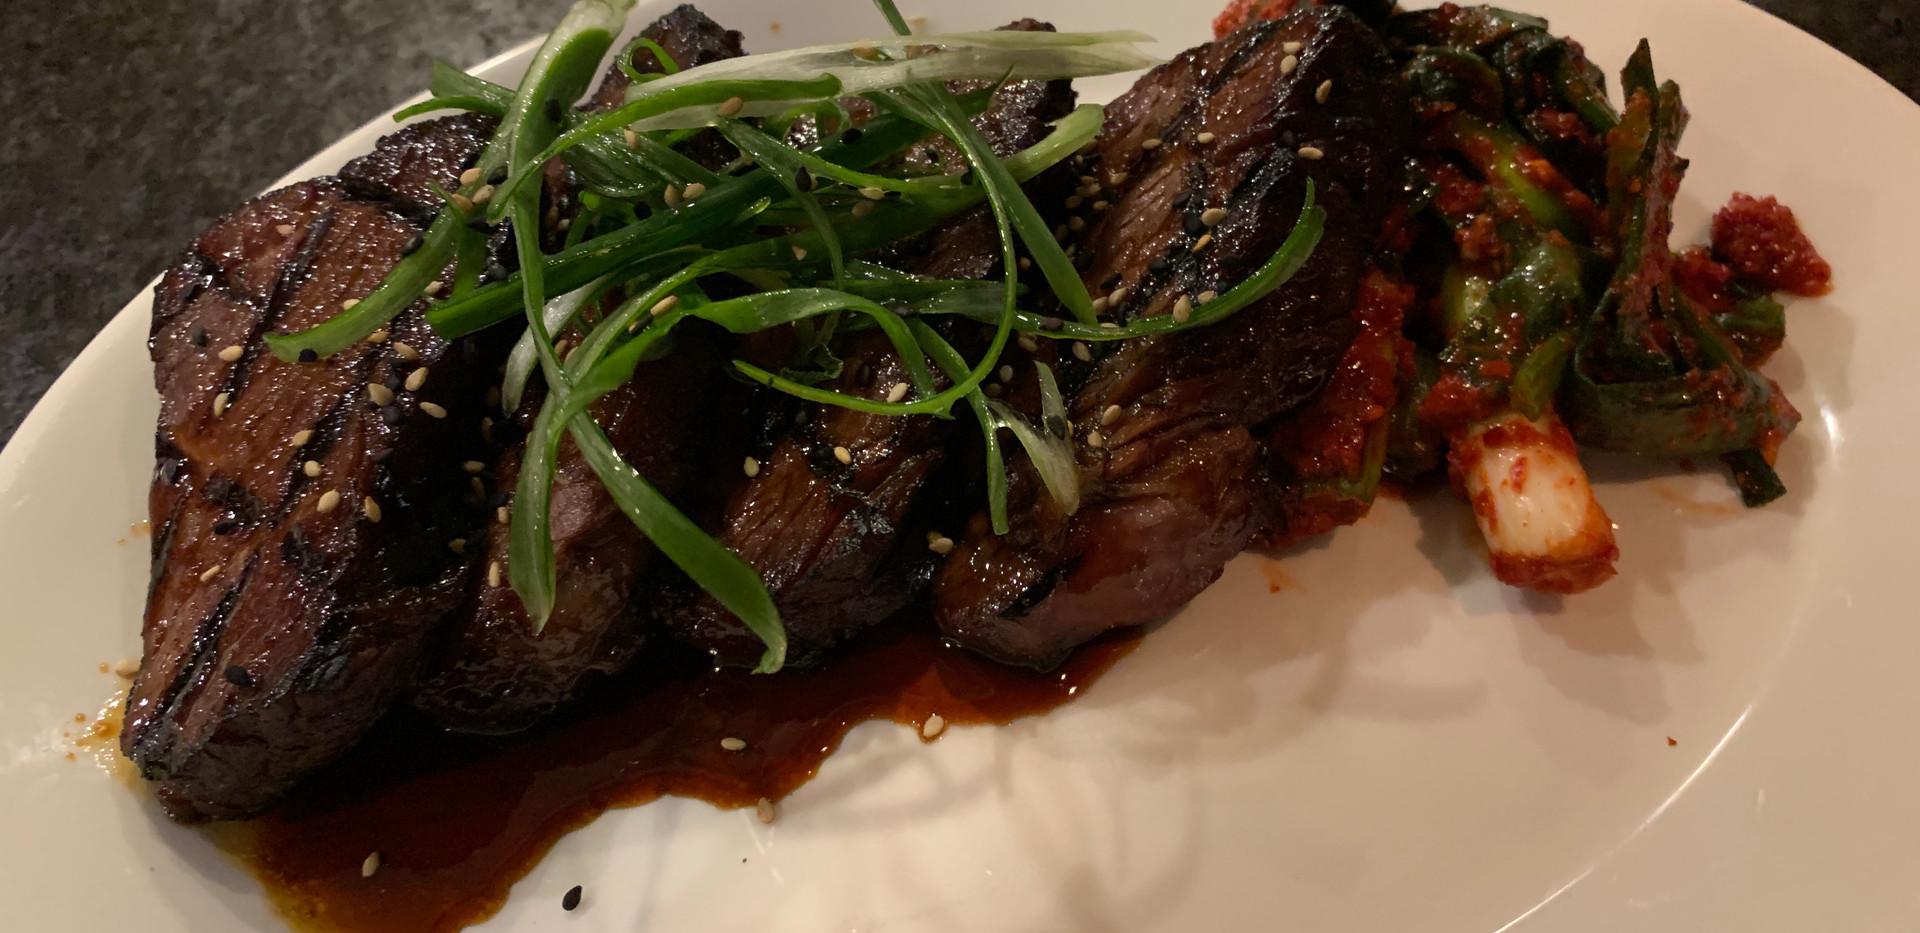 Grilled Beef Short Rib Steak (Bul Galbi)